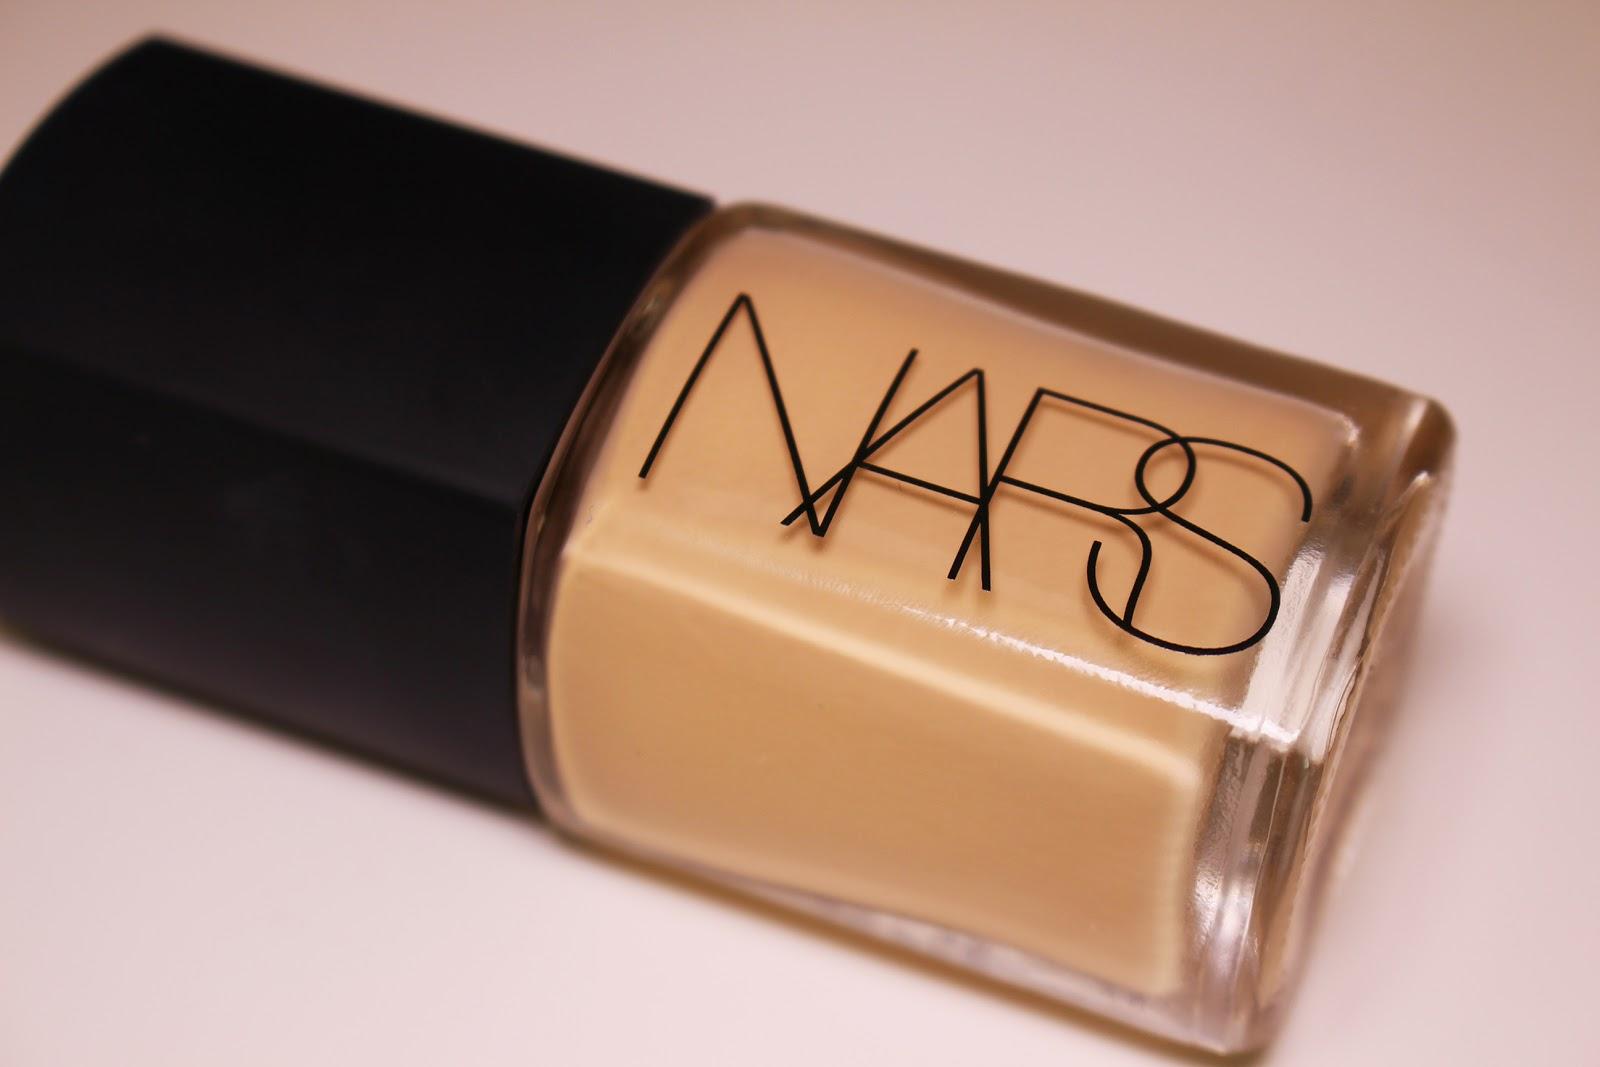 NARS Sheer Glow Foundation | Review + demo